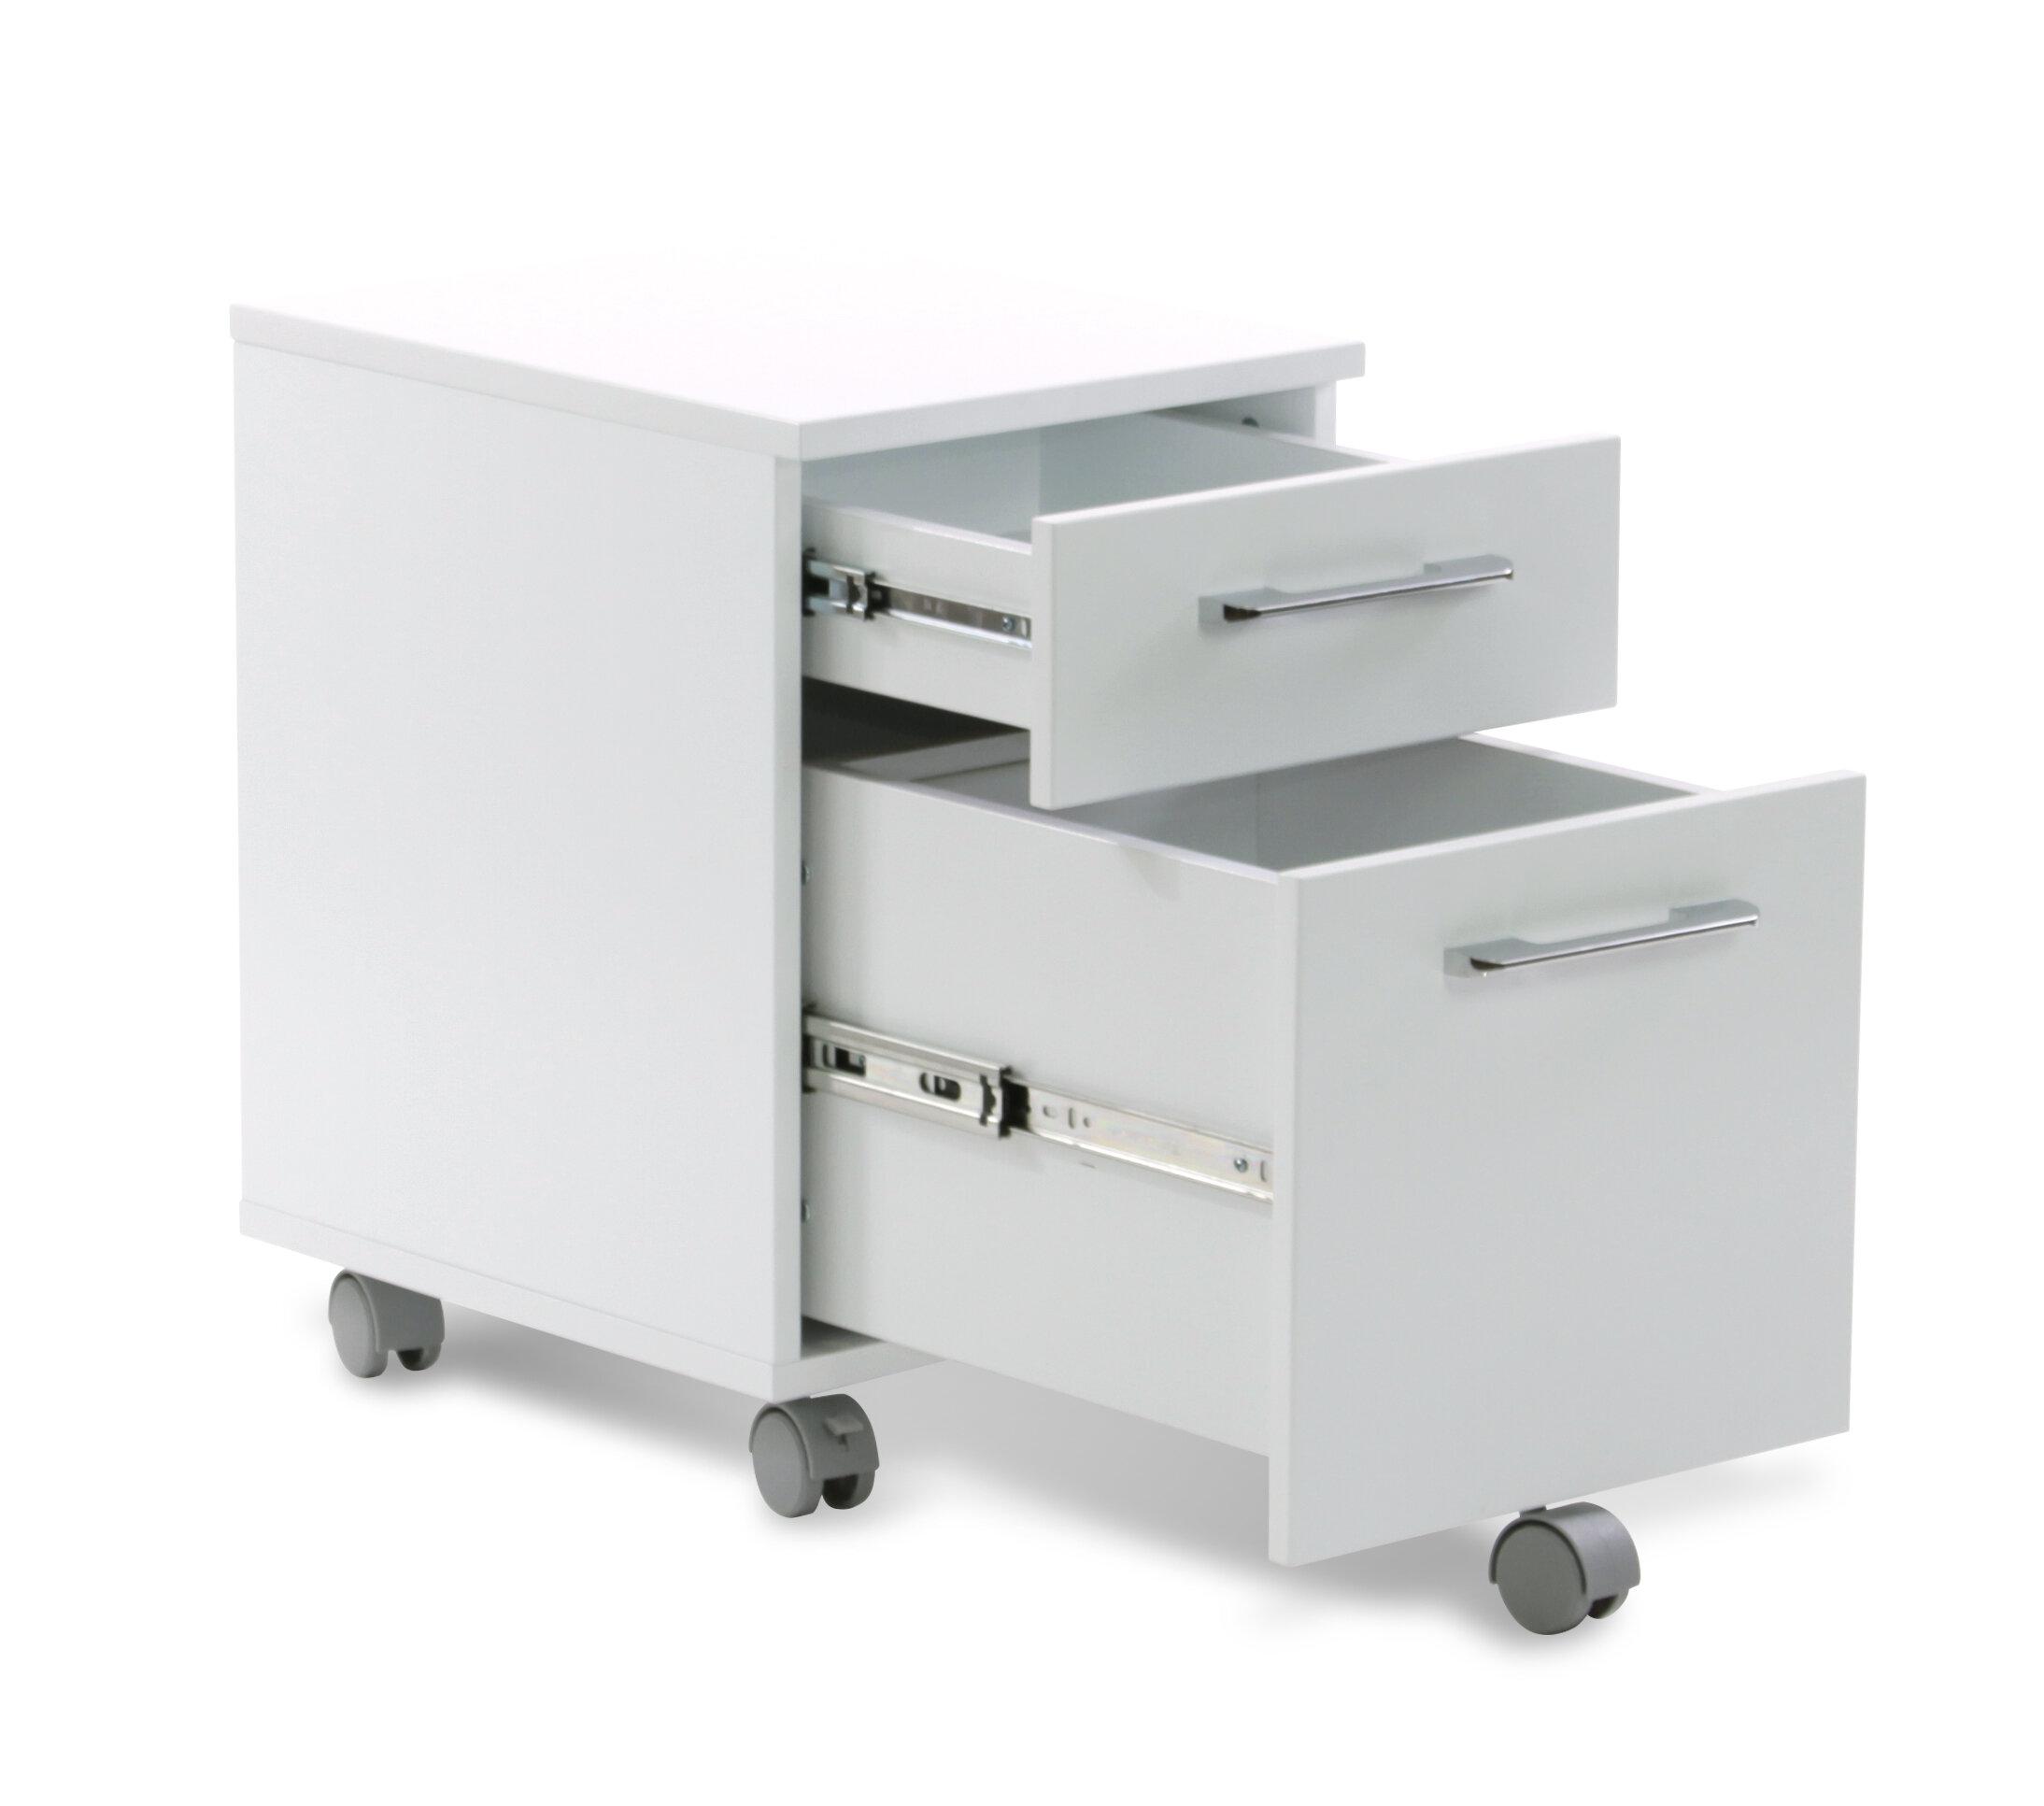 Comm Office Tarbes 2 Drawer Mobile Vertical Filing Cabinet Reviews Wayfair